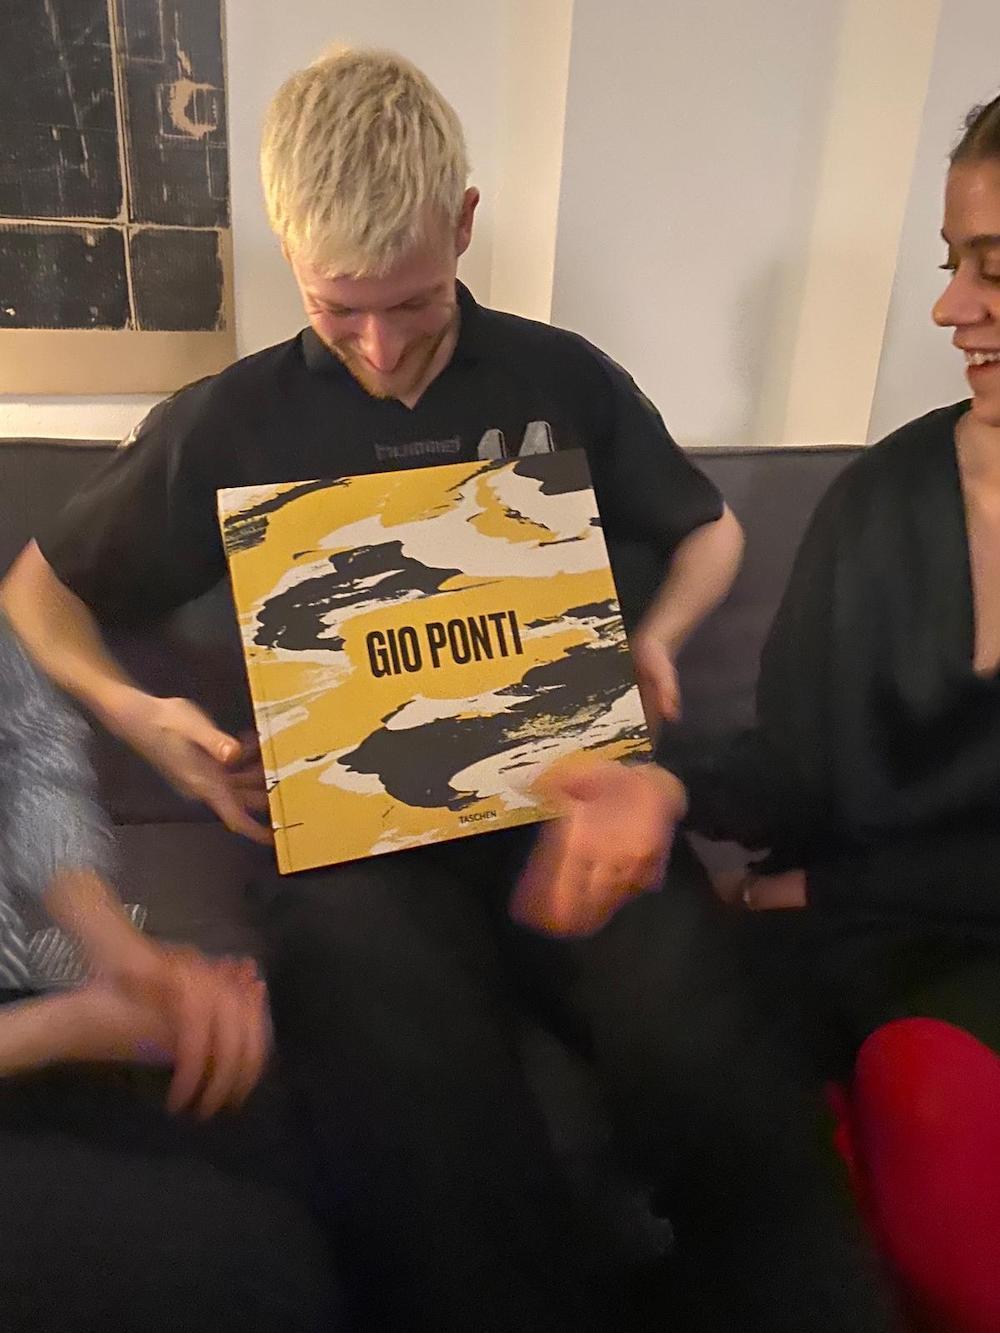 Karl Kolbitz presenting his new Gio Ponti book for Taschen.